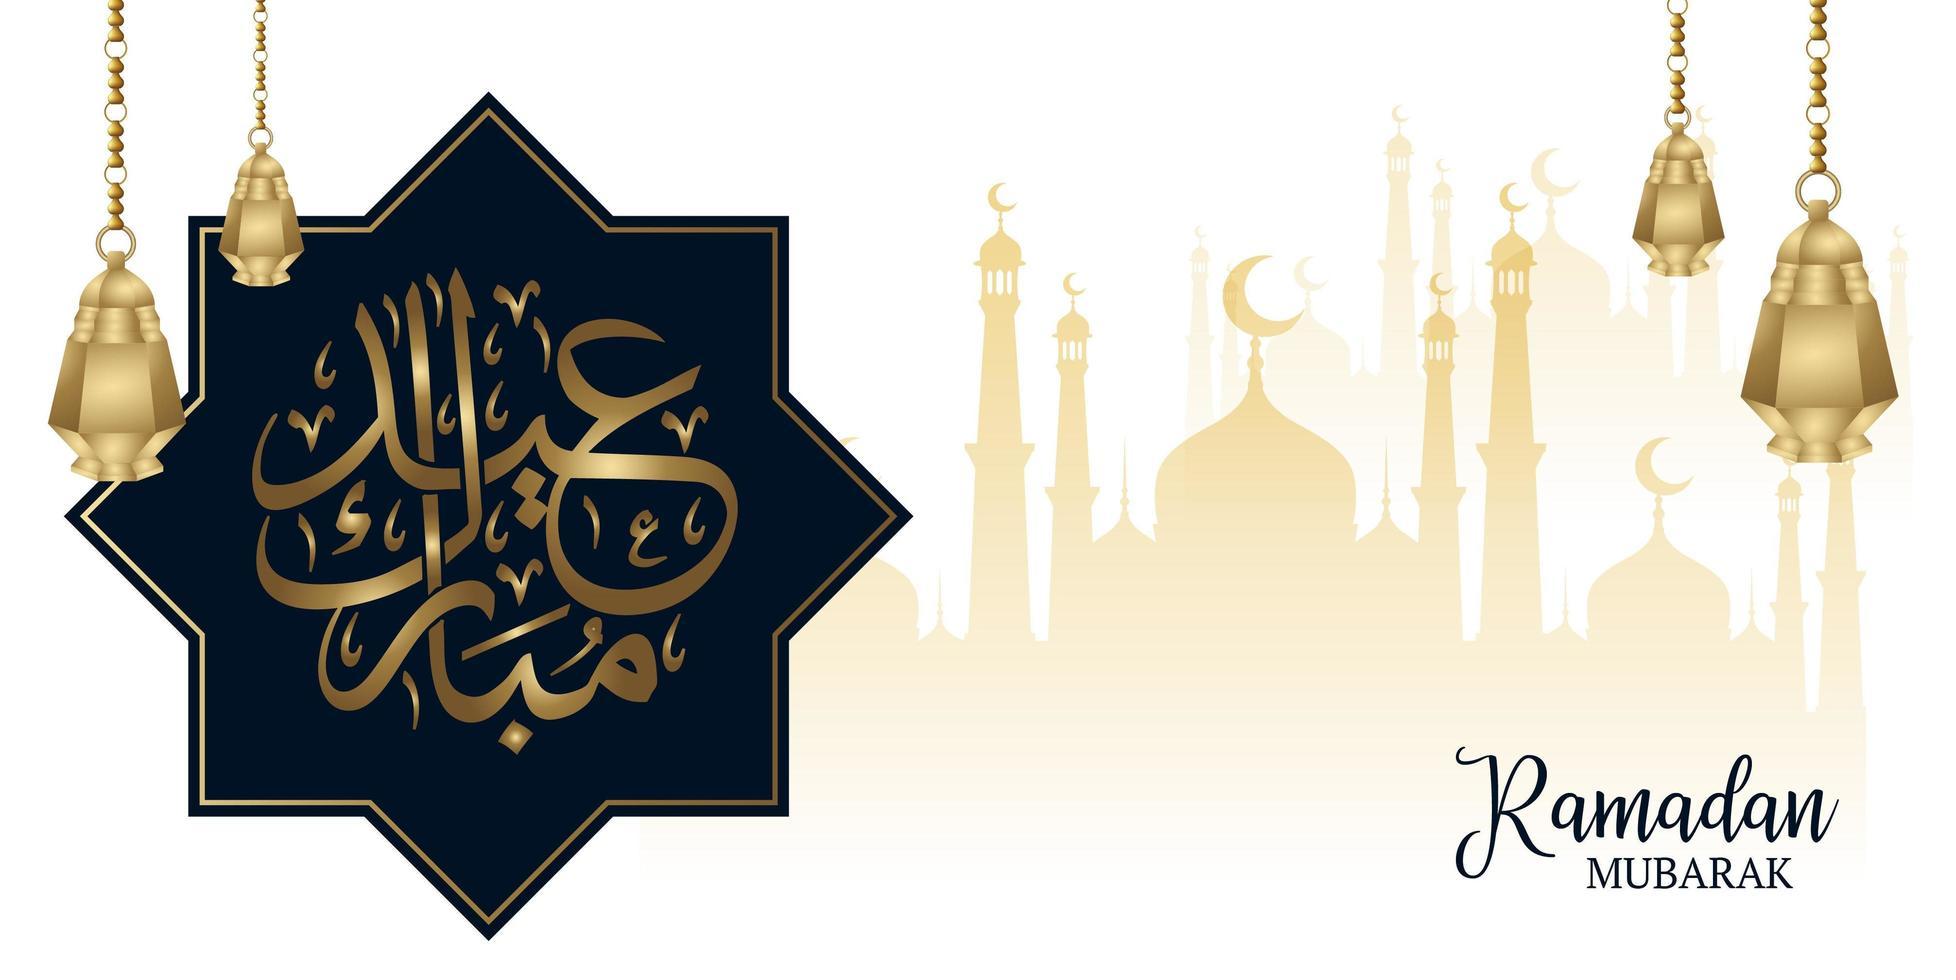 Ramadan Mubarak Golden Mosque silhouette design vettore